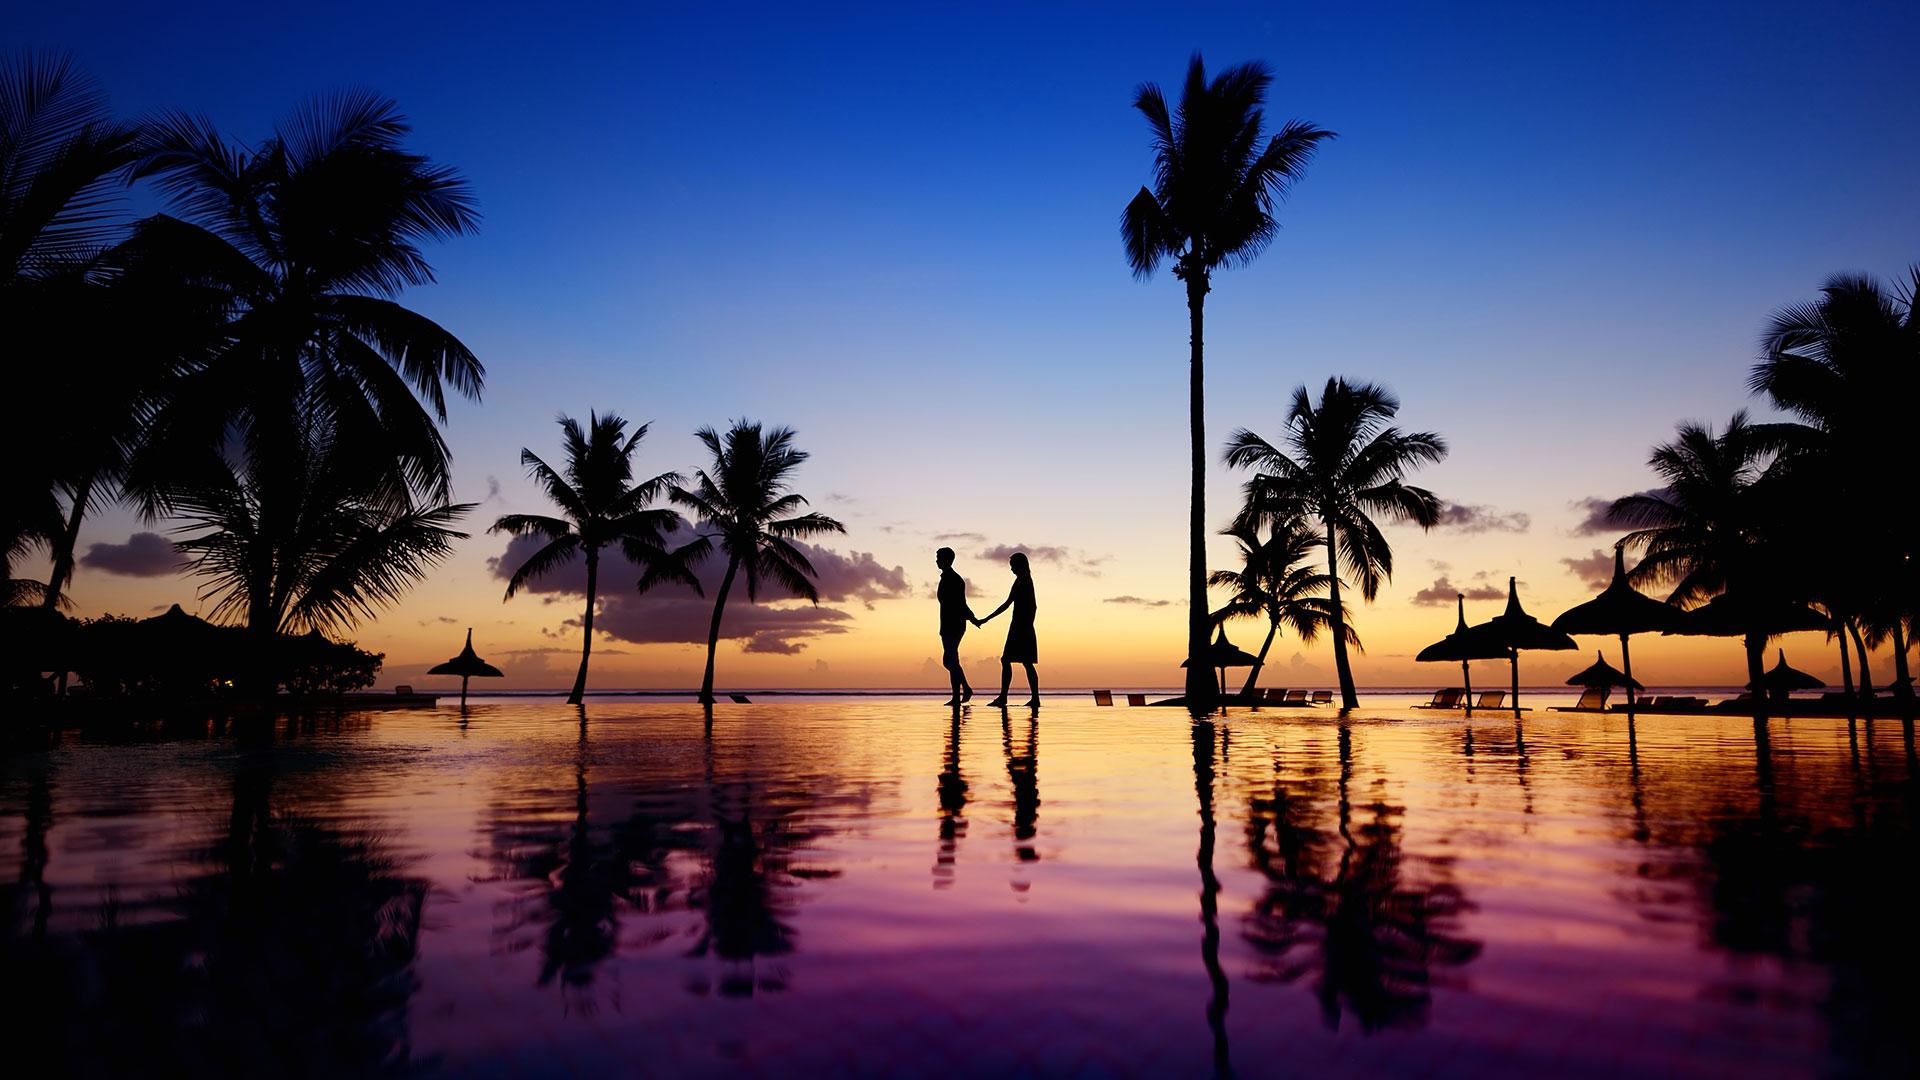 Sejur plaja Punta Cana, Republica Dominicana, 10 zile - noiembrie 2021